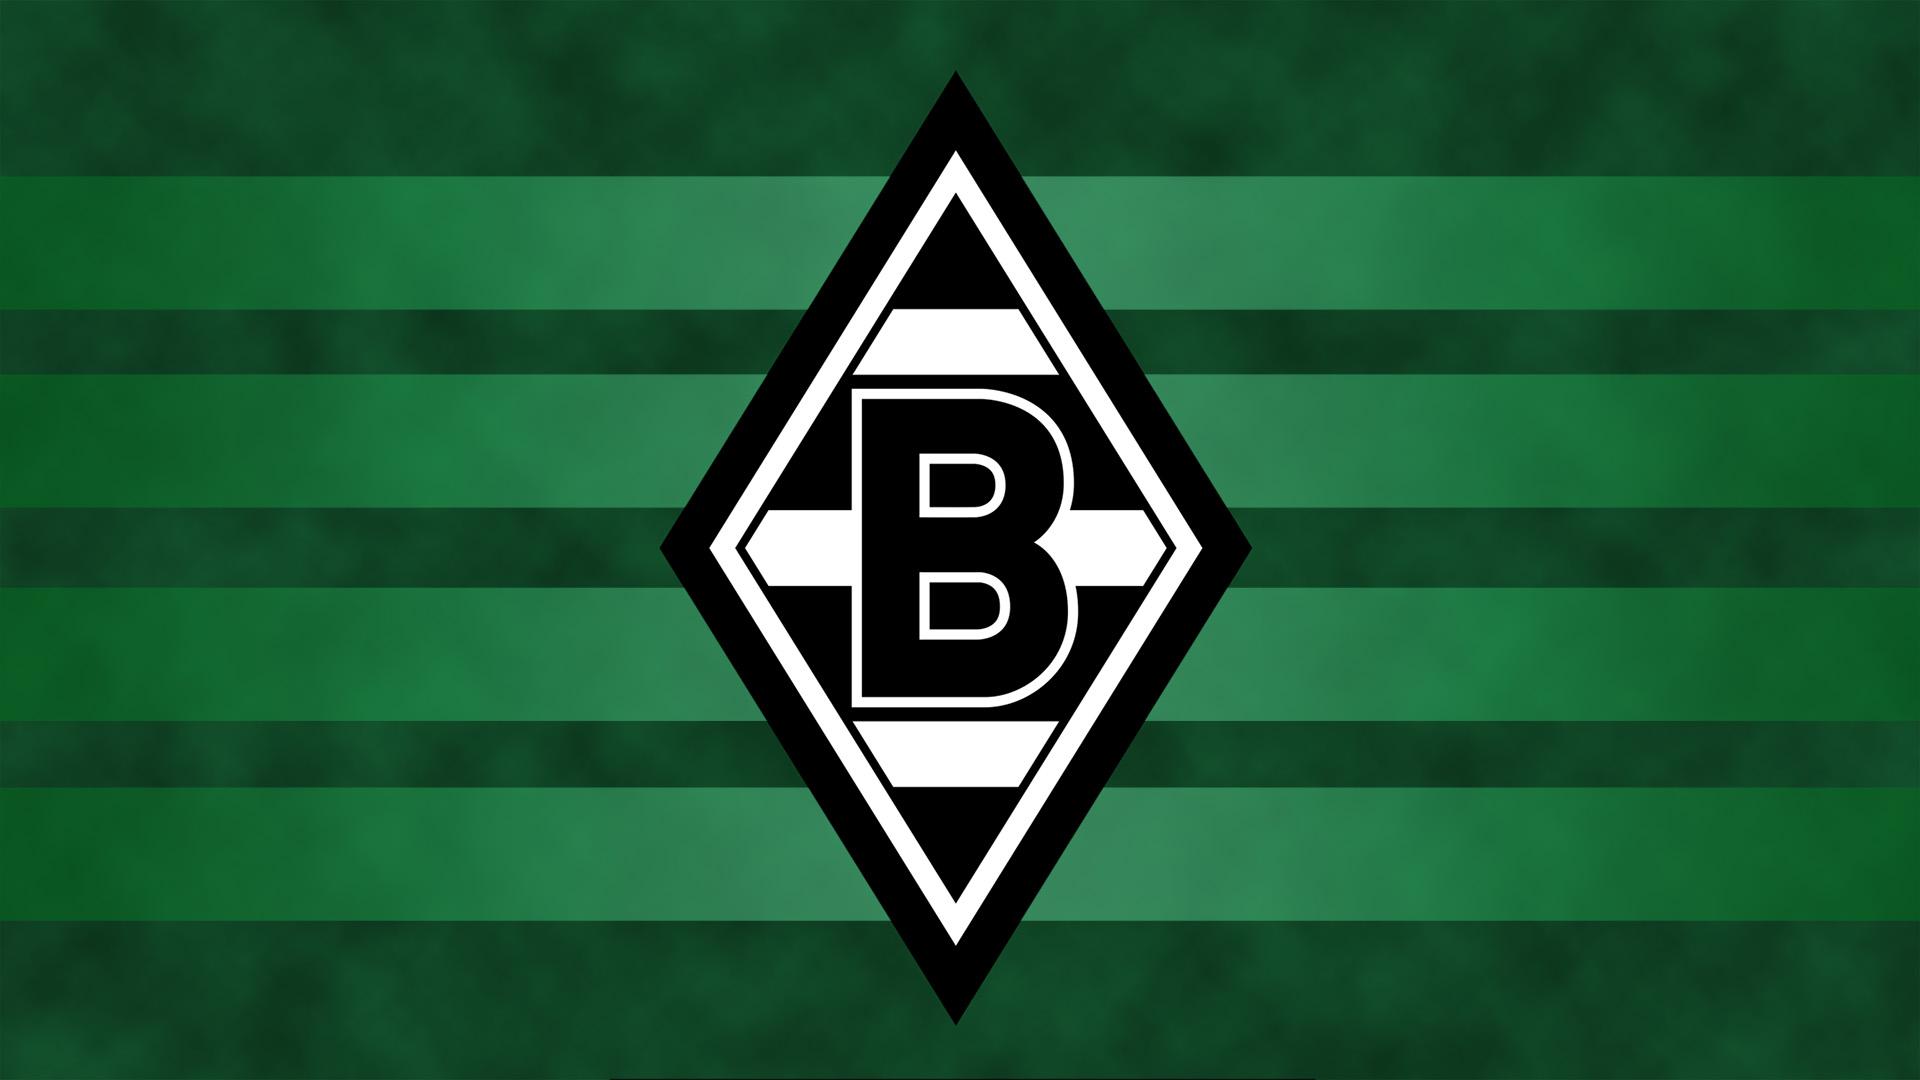 Lieblings Borussia Mönchengladbach Bilder @WY_51